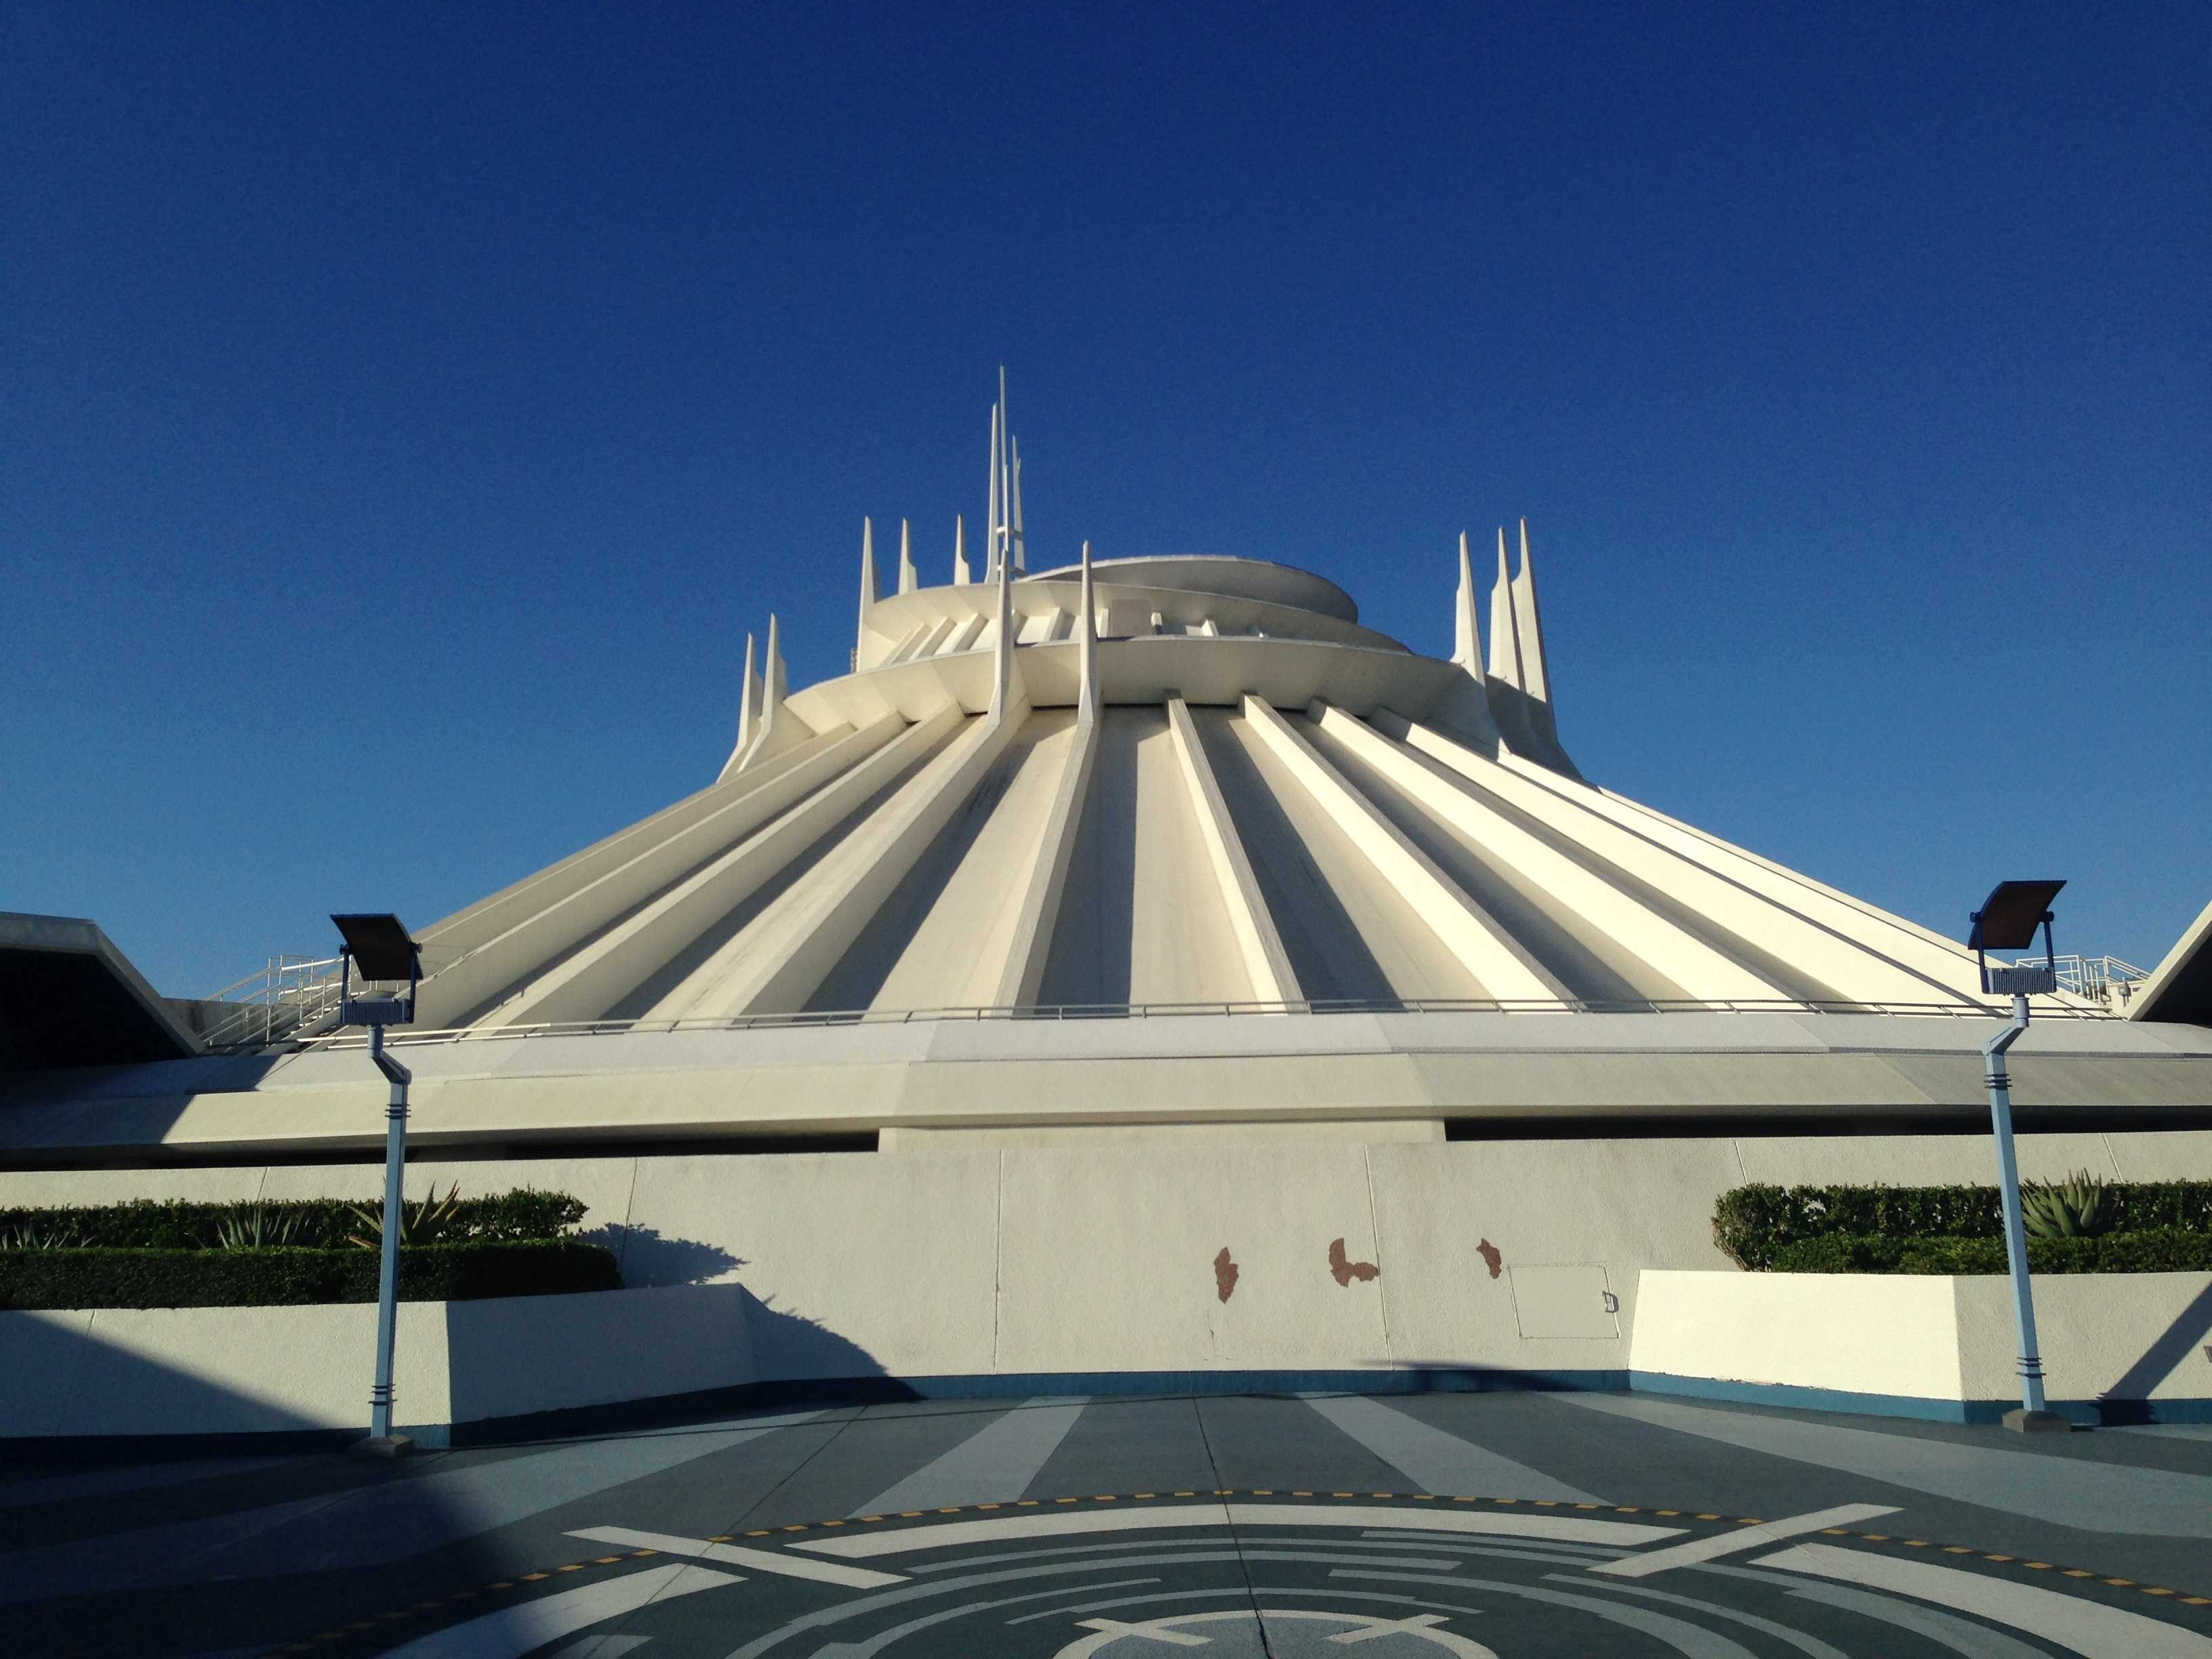 10 Scariest Rides At Disneyland California Adventure